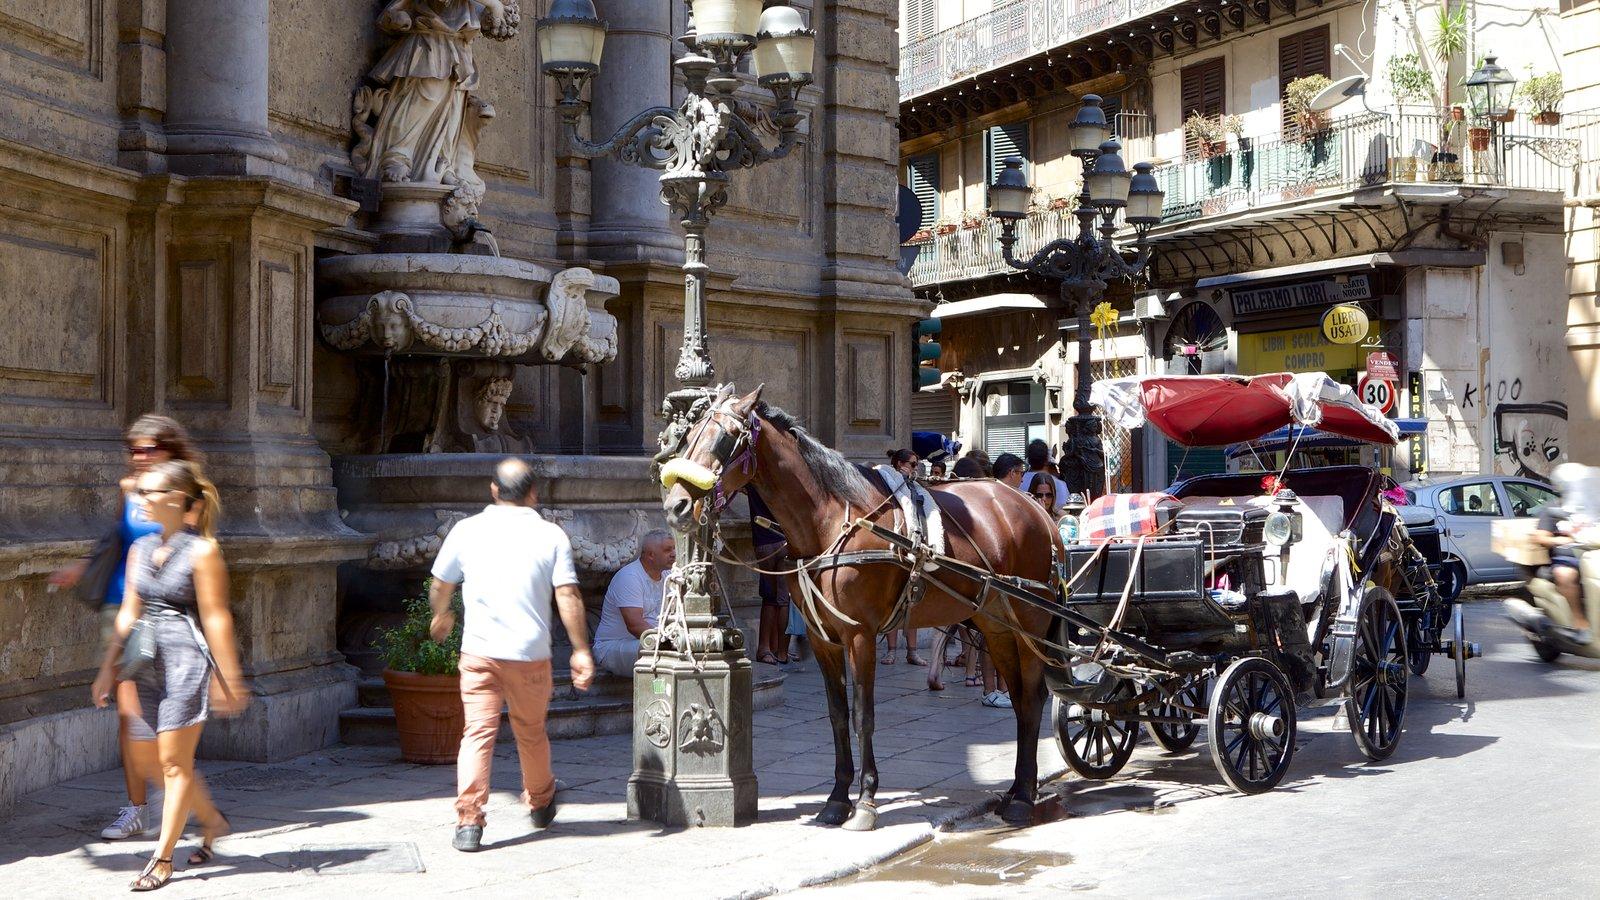 Via Maqueda showing heritage elements, street scenes and land animals